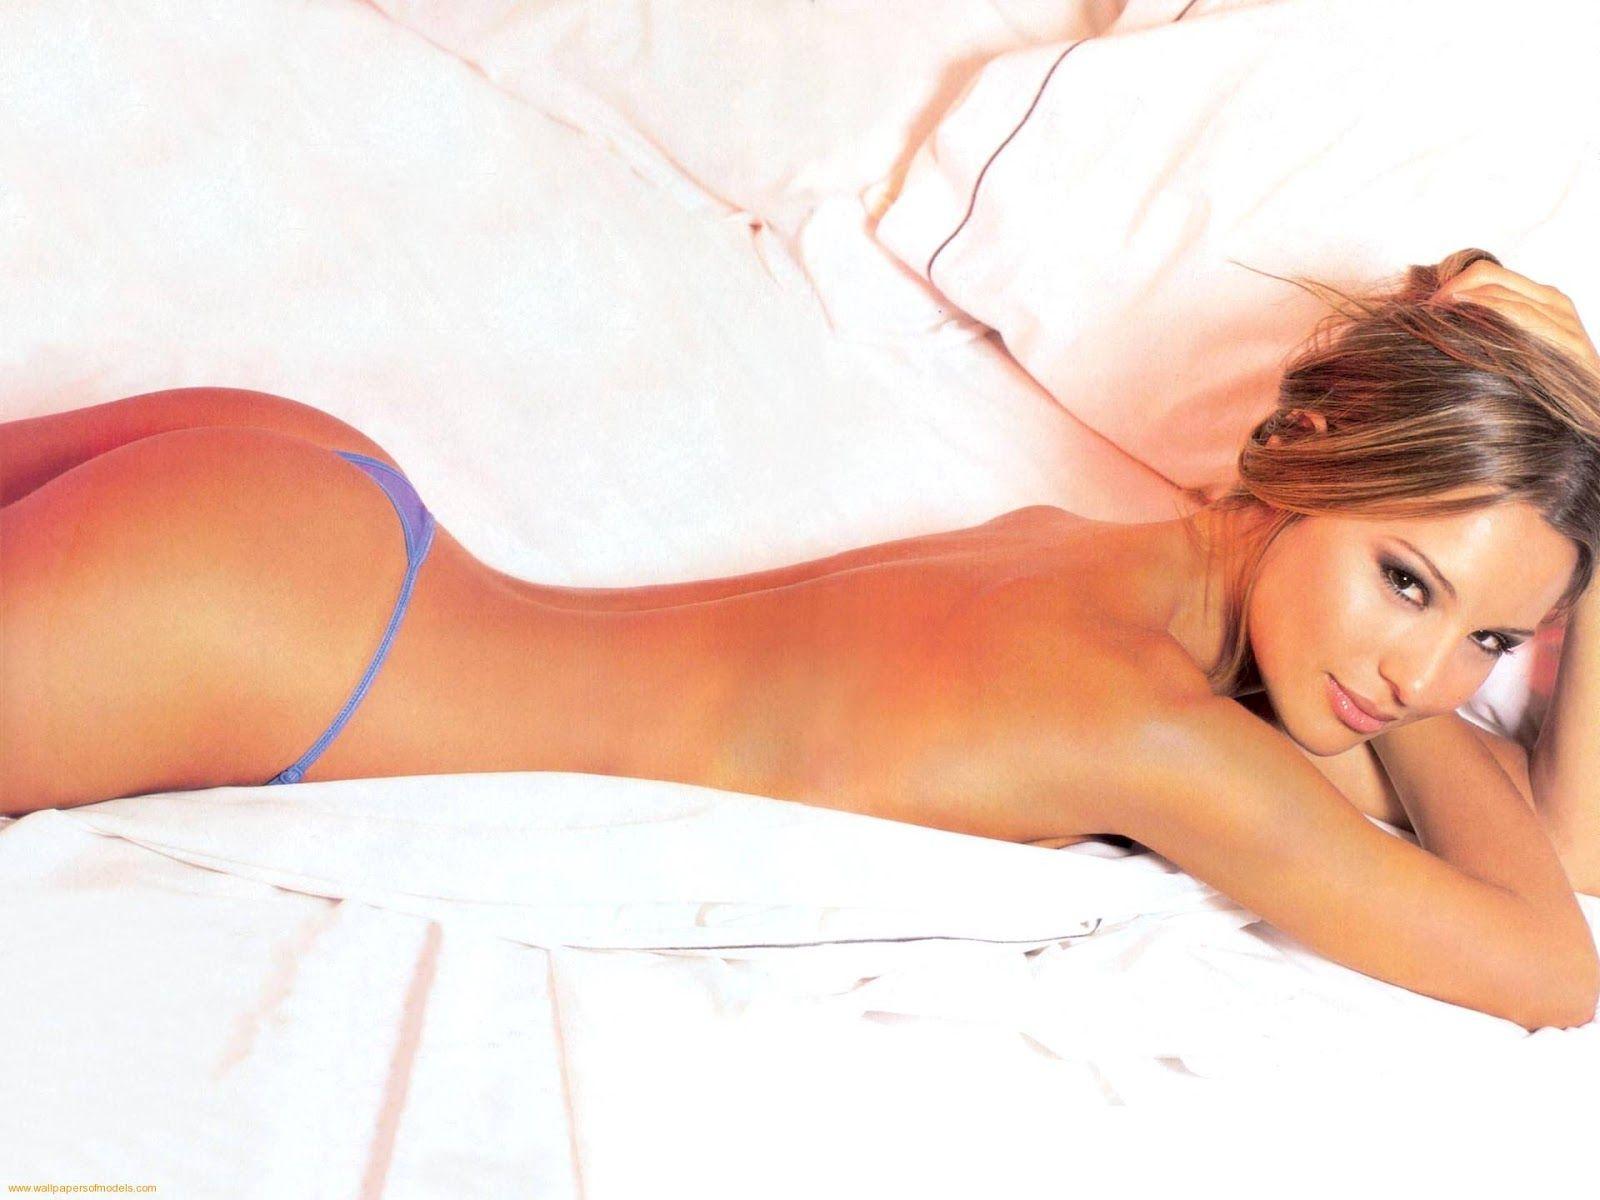 Maria de erotic sensual tappersex show en el feda 2015